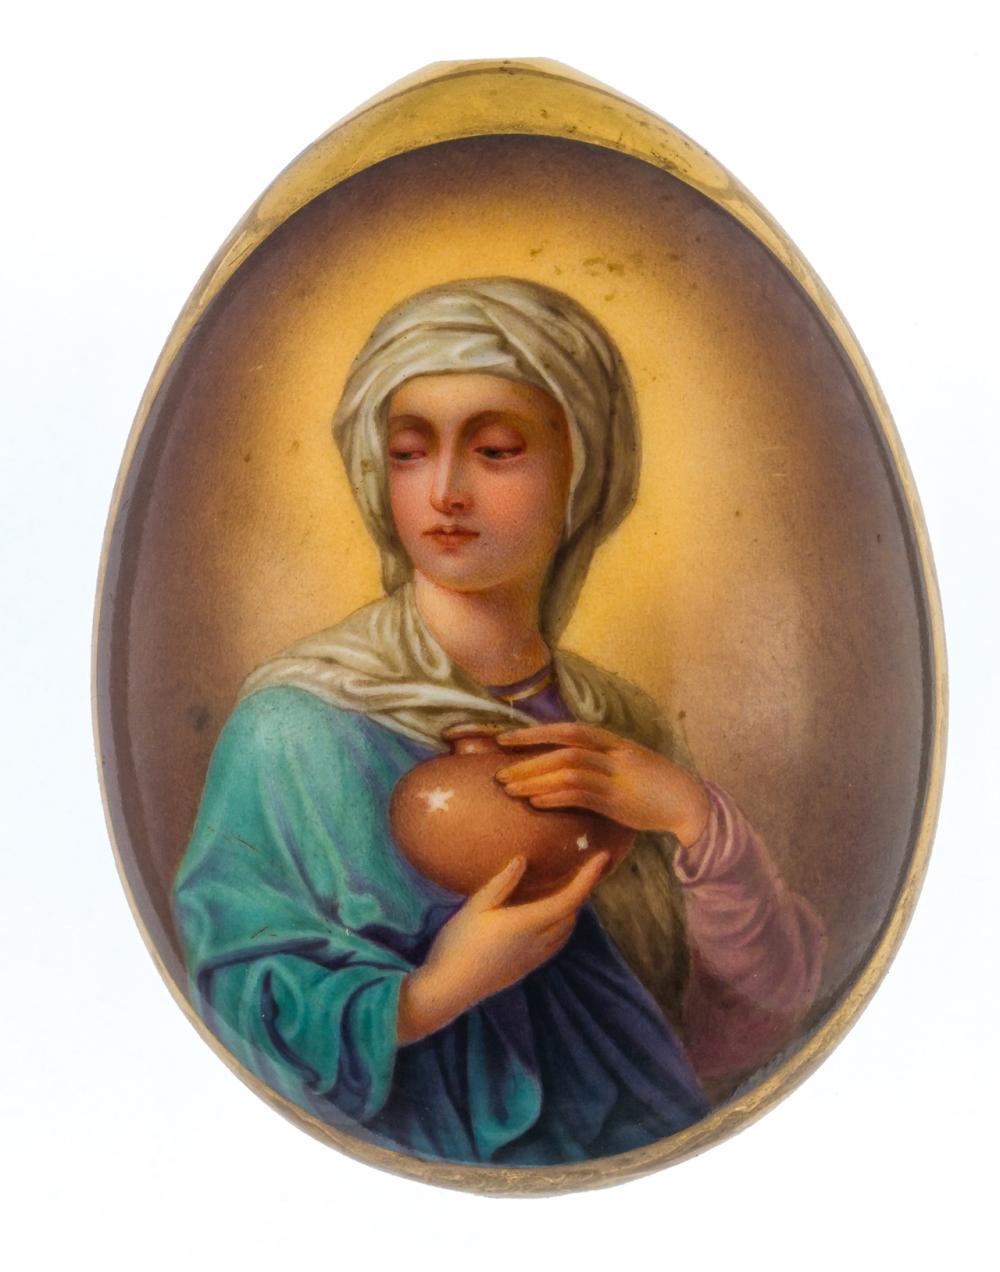 MONOGRAMED RUSSIAN PORCELAIN EASTER EGG SHOWING MARY MAGDALENE